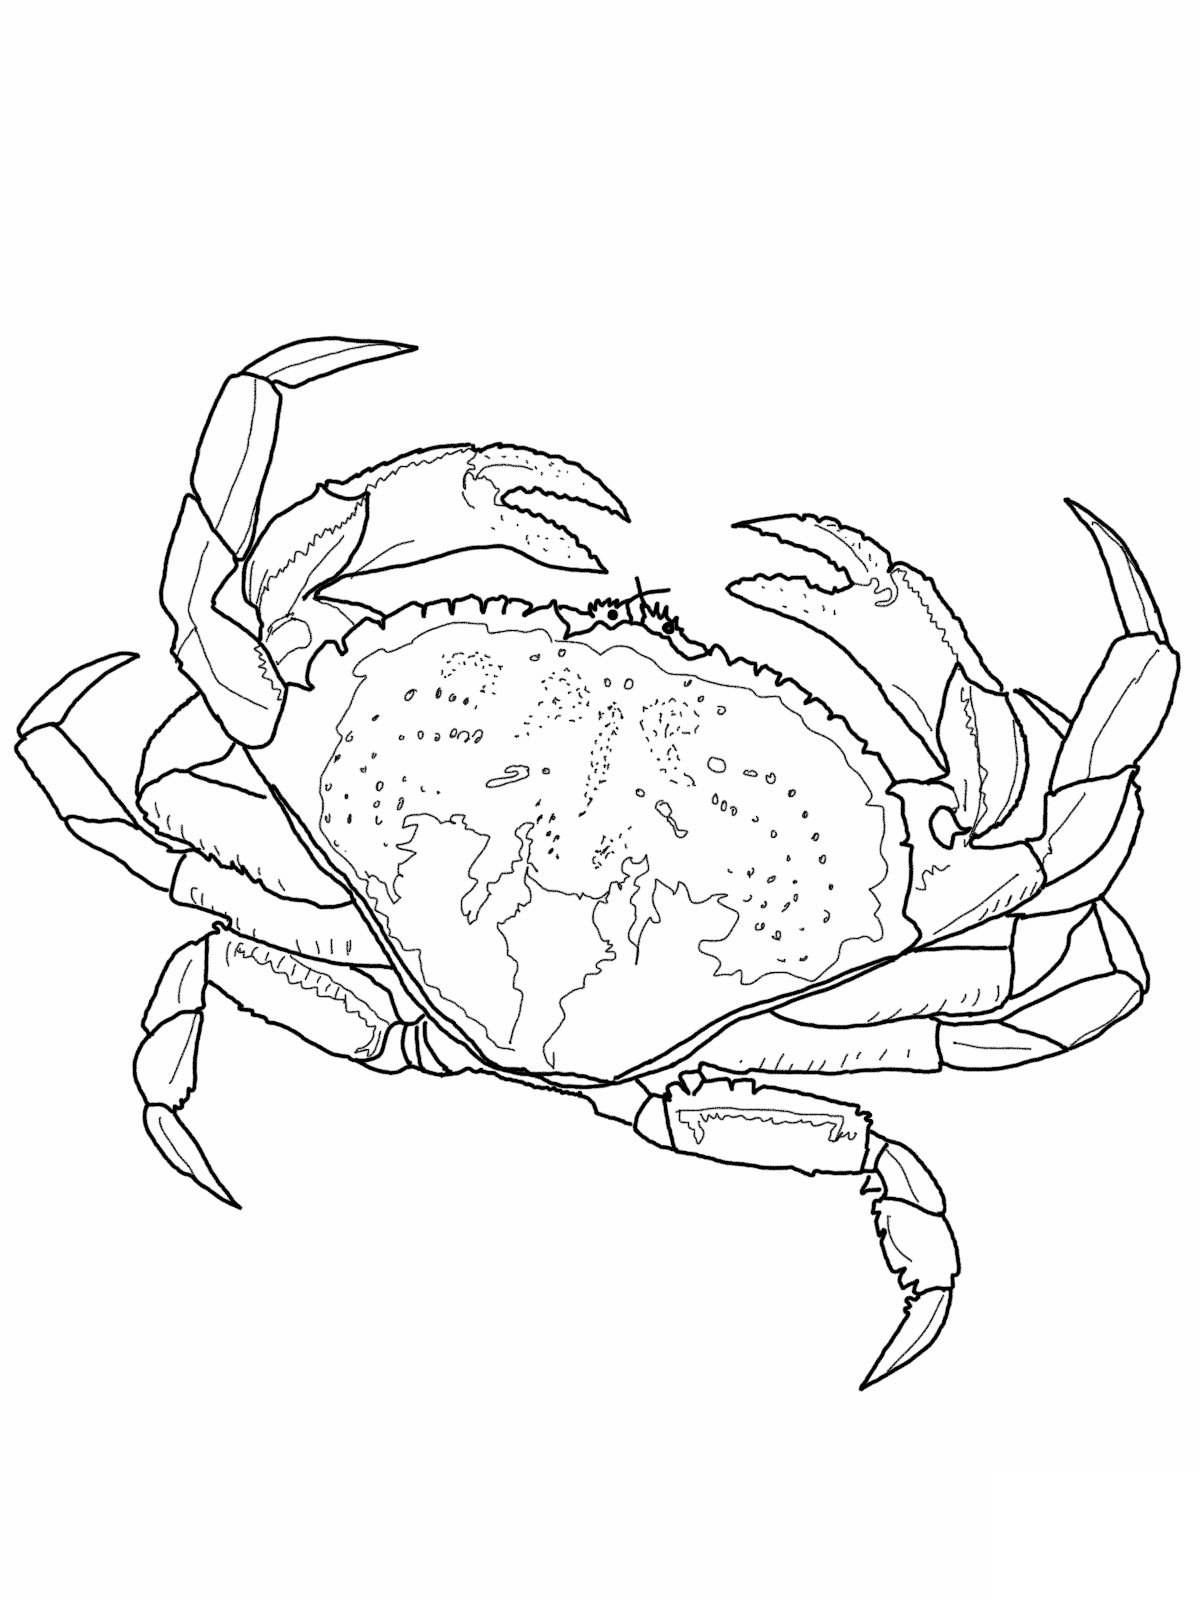 Coconut Crab coloring #10, Download drawings